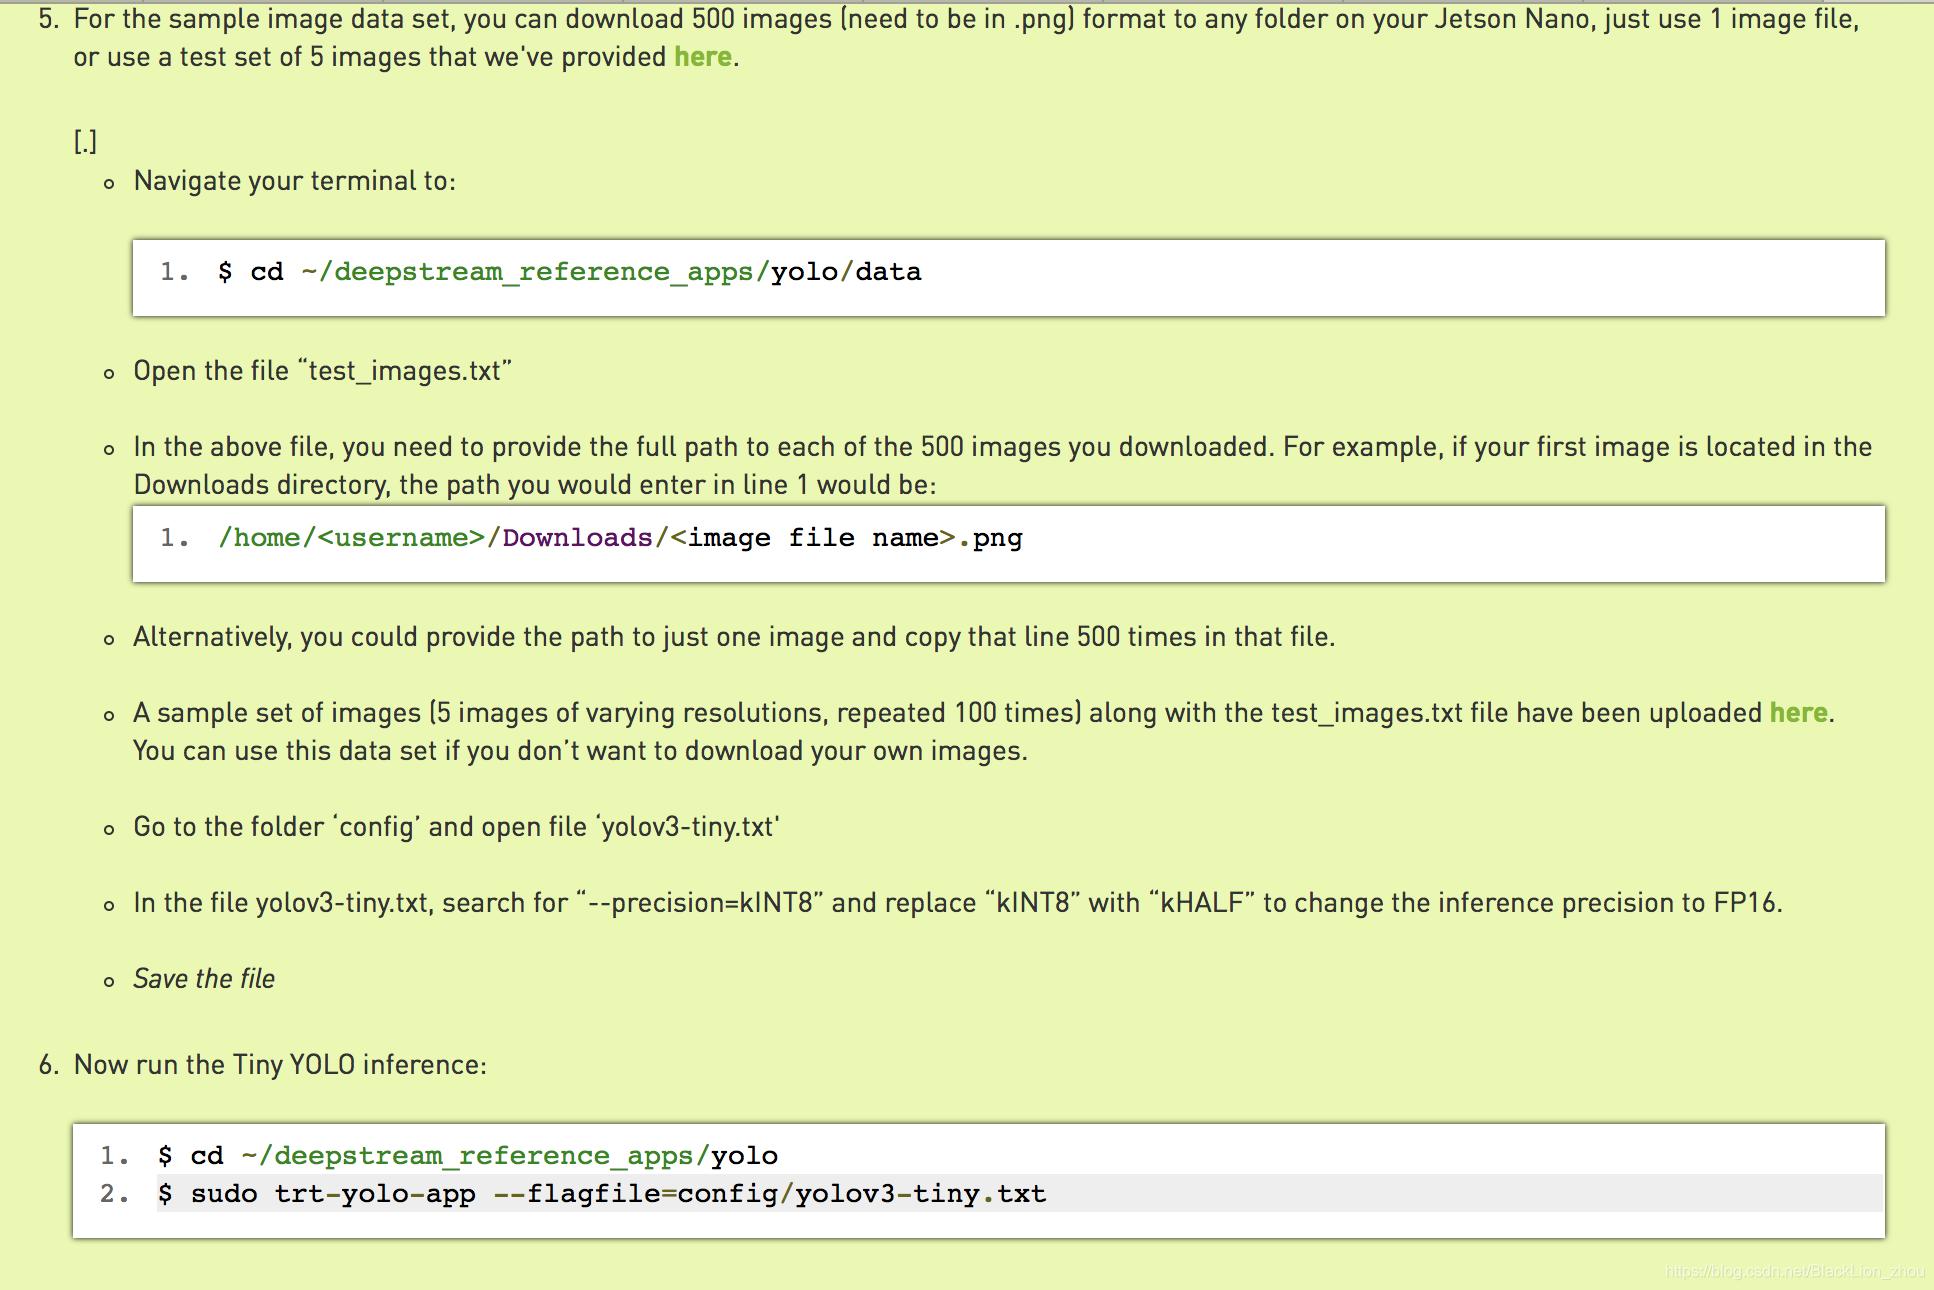 NANO上利用tensorRT的trt-yolo 进行视频检测- BlackLion_zhou的